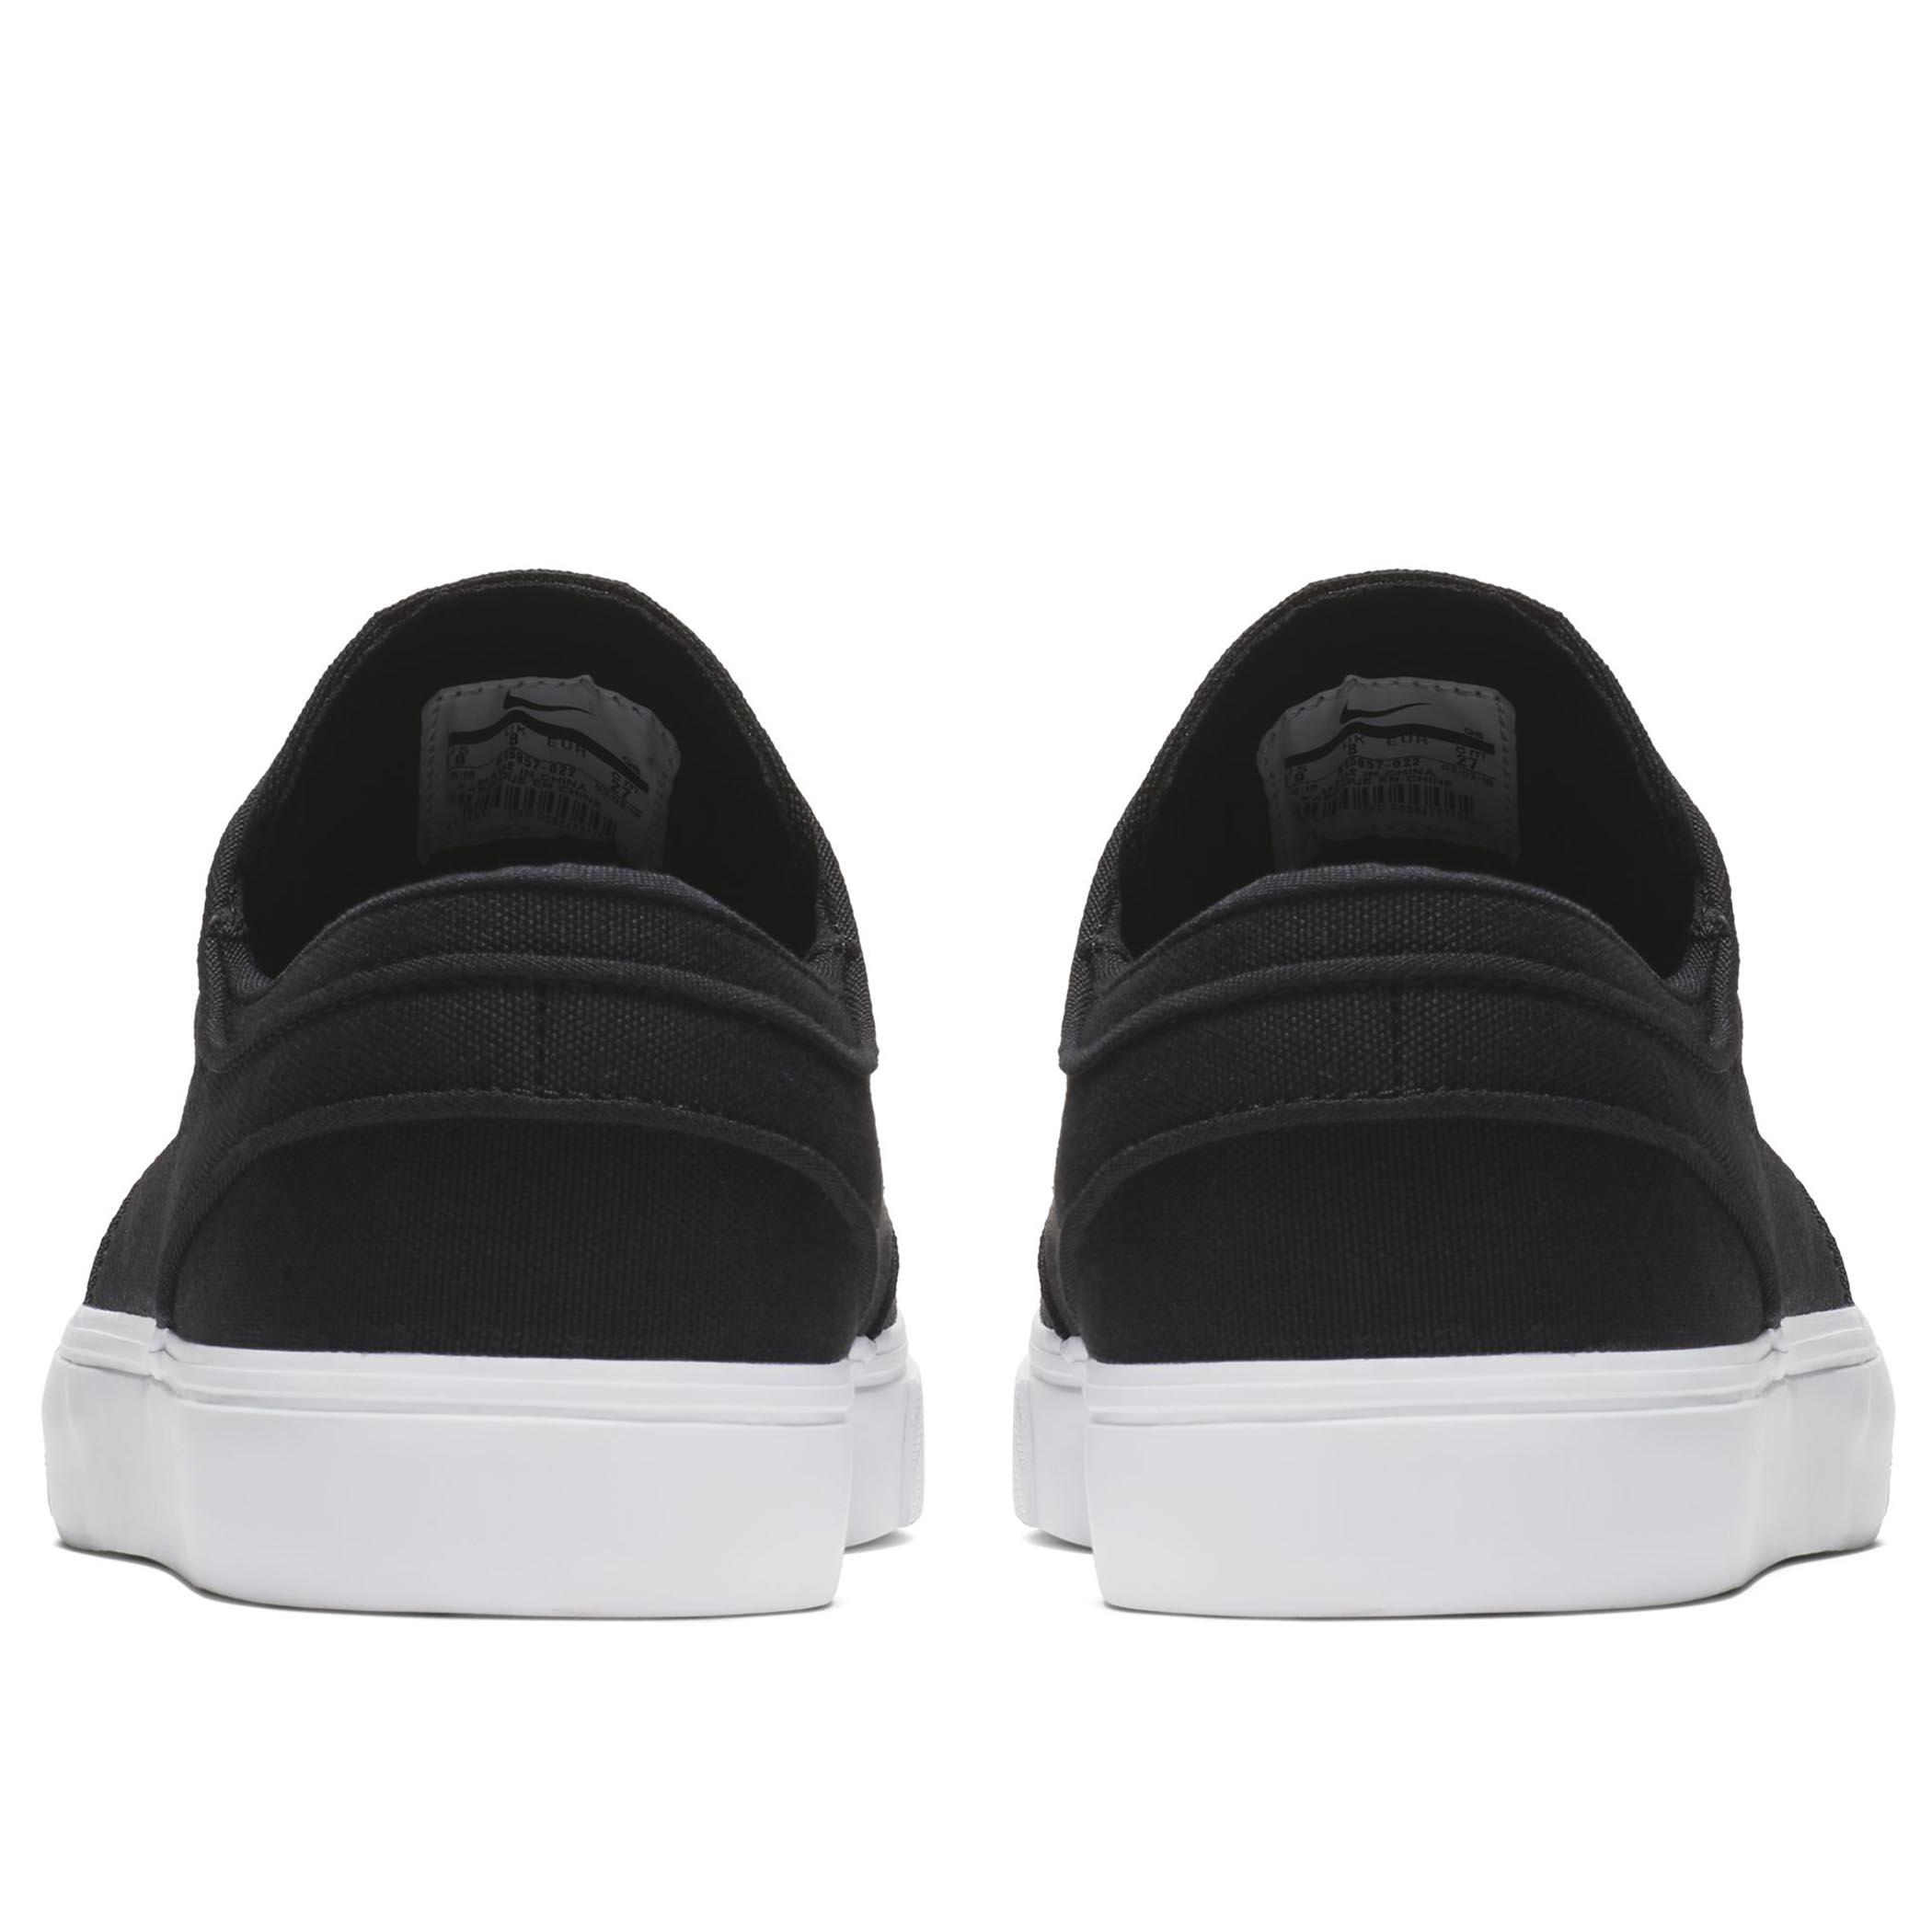 quality design a061b efd62 Мужские кеды Nike SB Zoom Stefan Janoski Canvas Black Black-White - фото 4